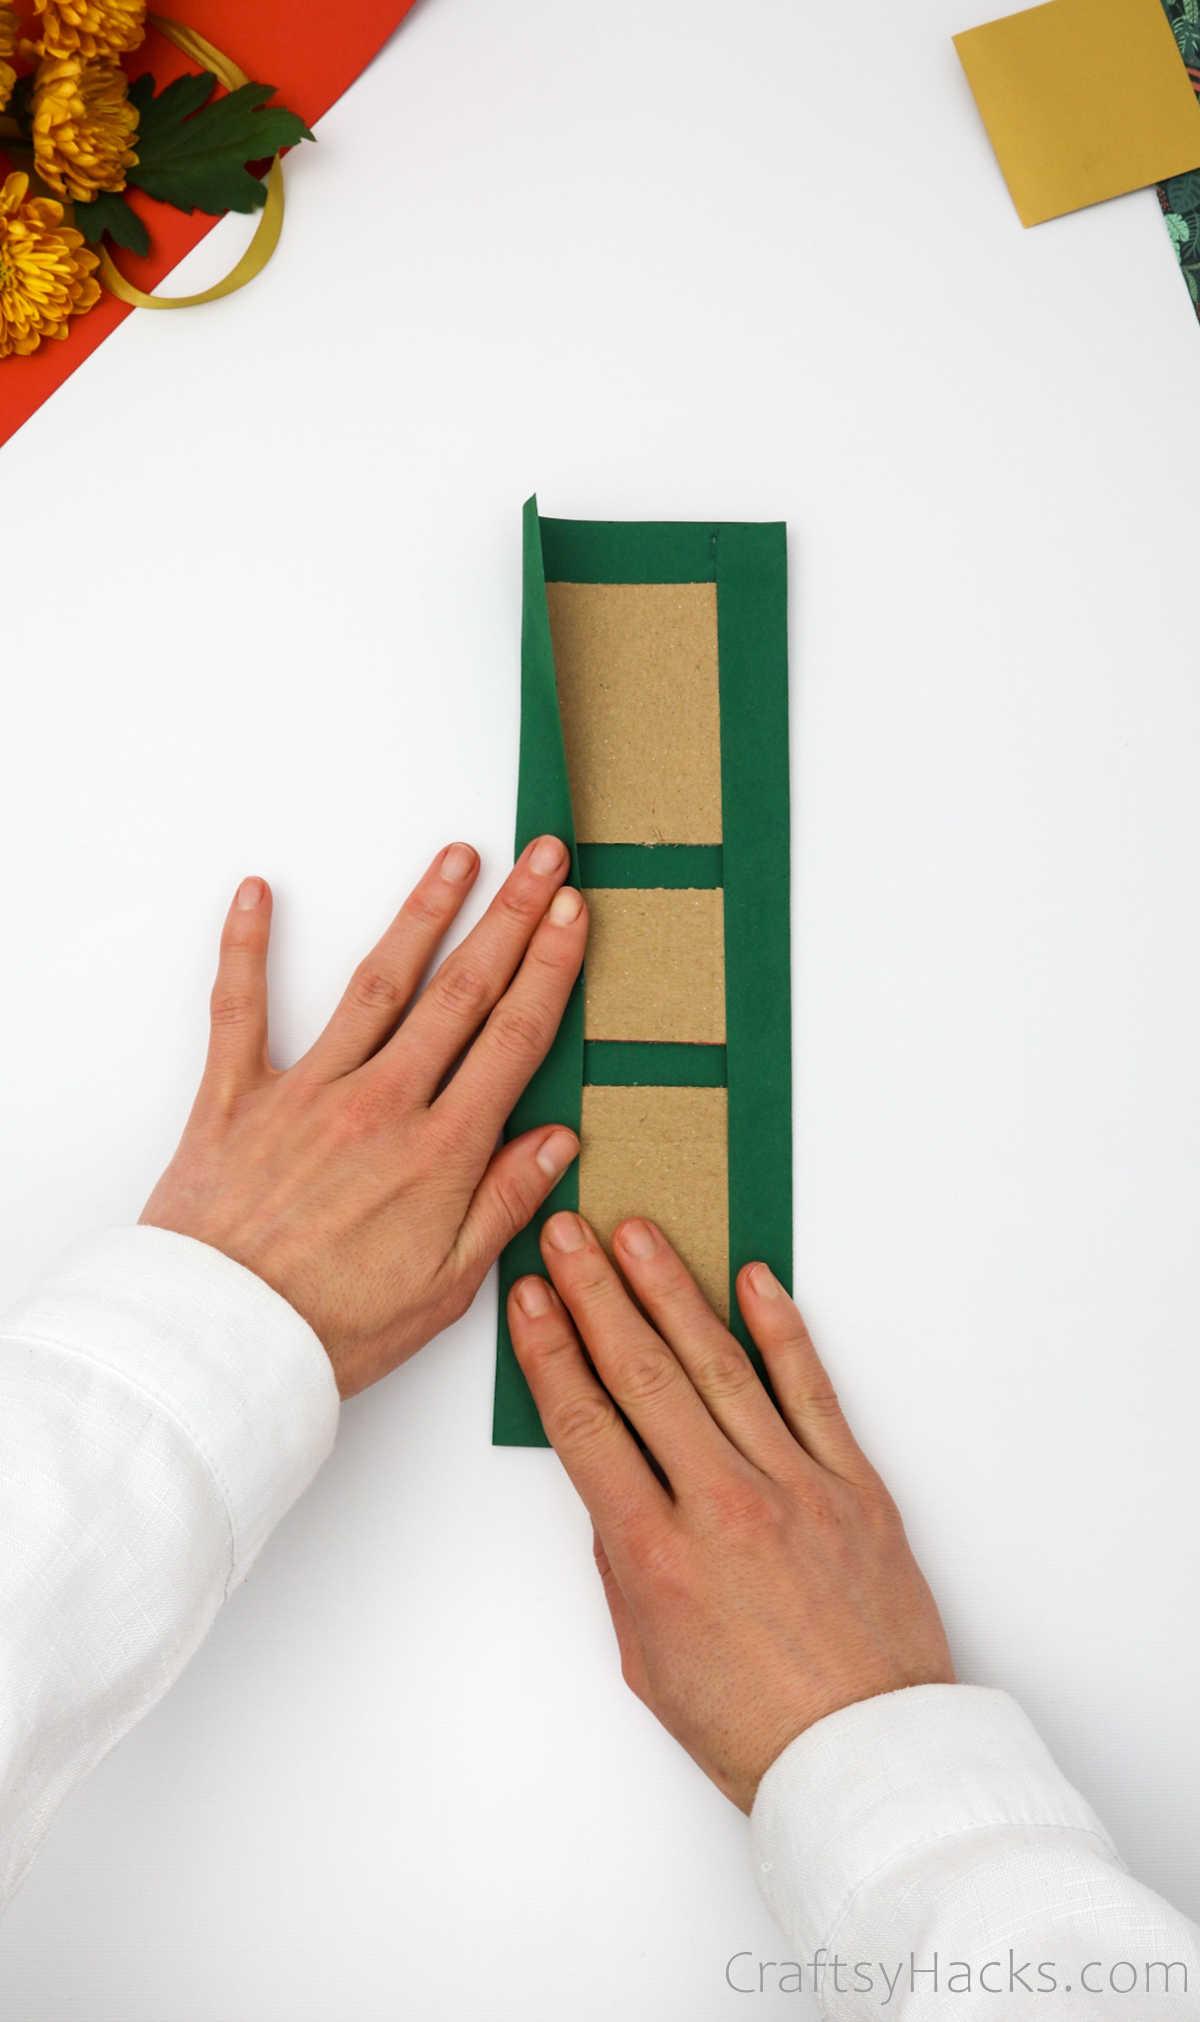 folding paper over cardboard